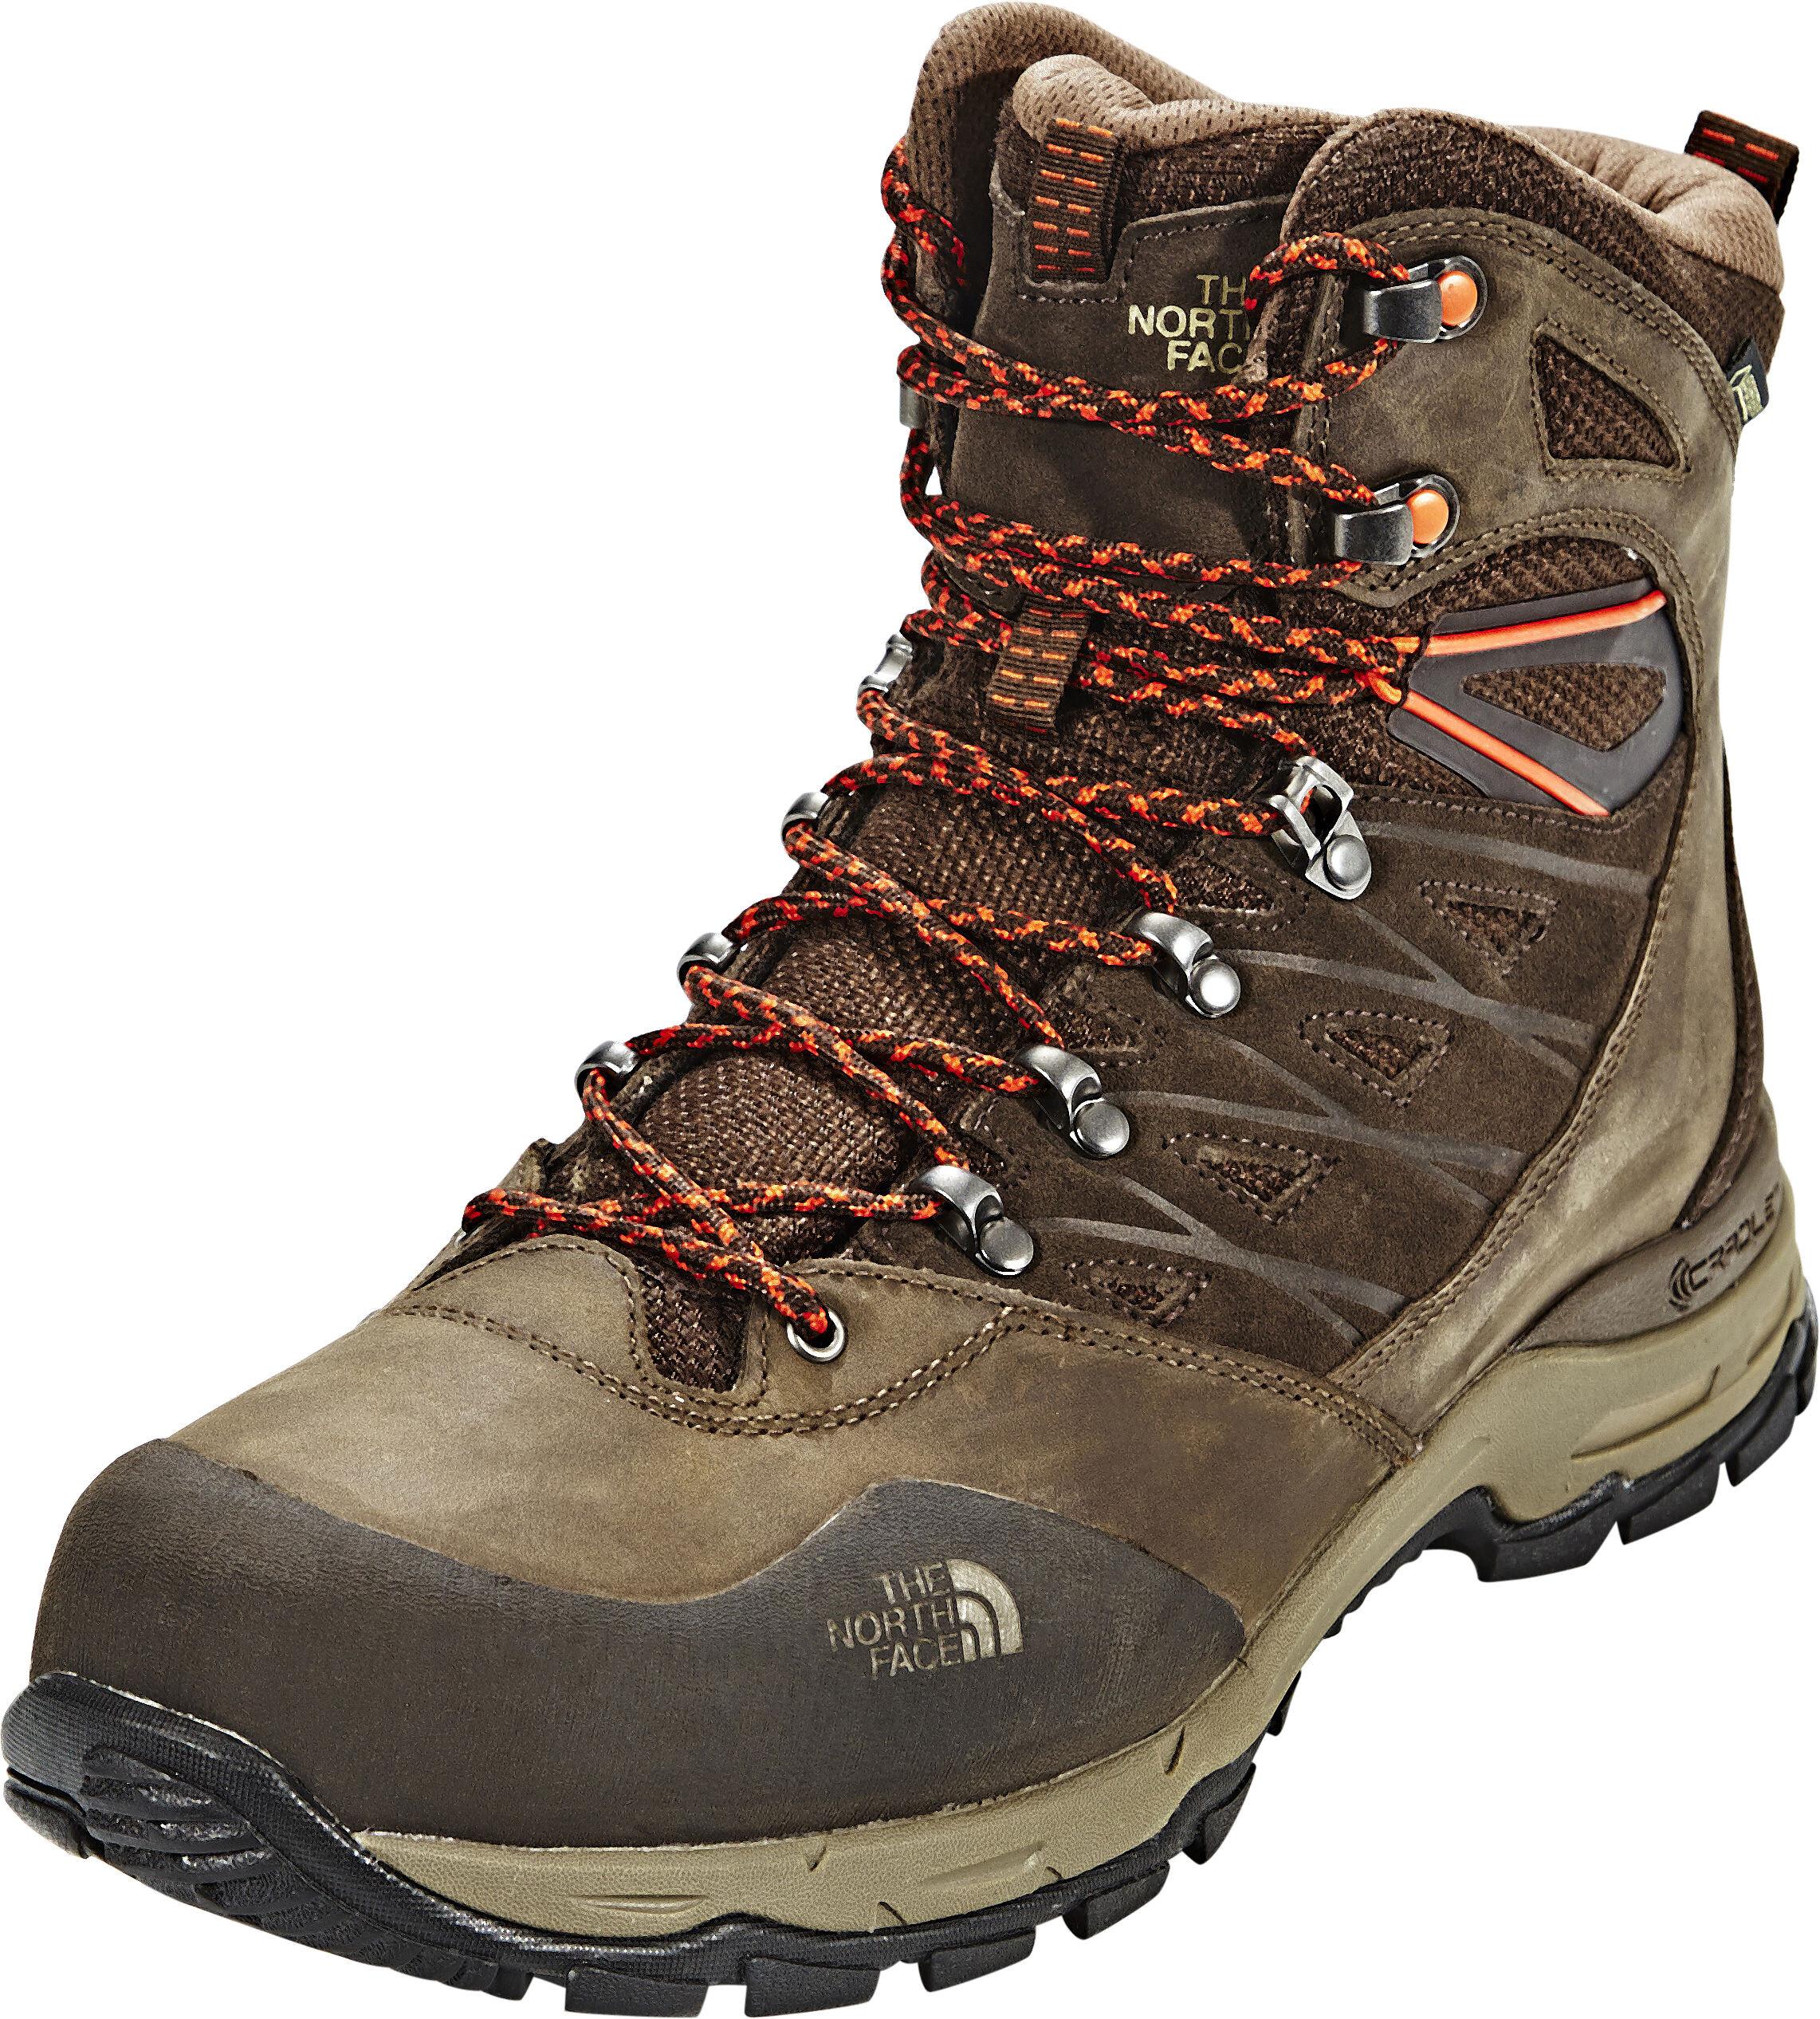 66eb0080a3a The North Face Hedgehog Trek GTX - Chaussures Homme - gris marron ...